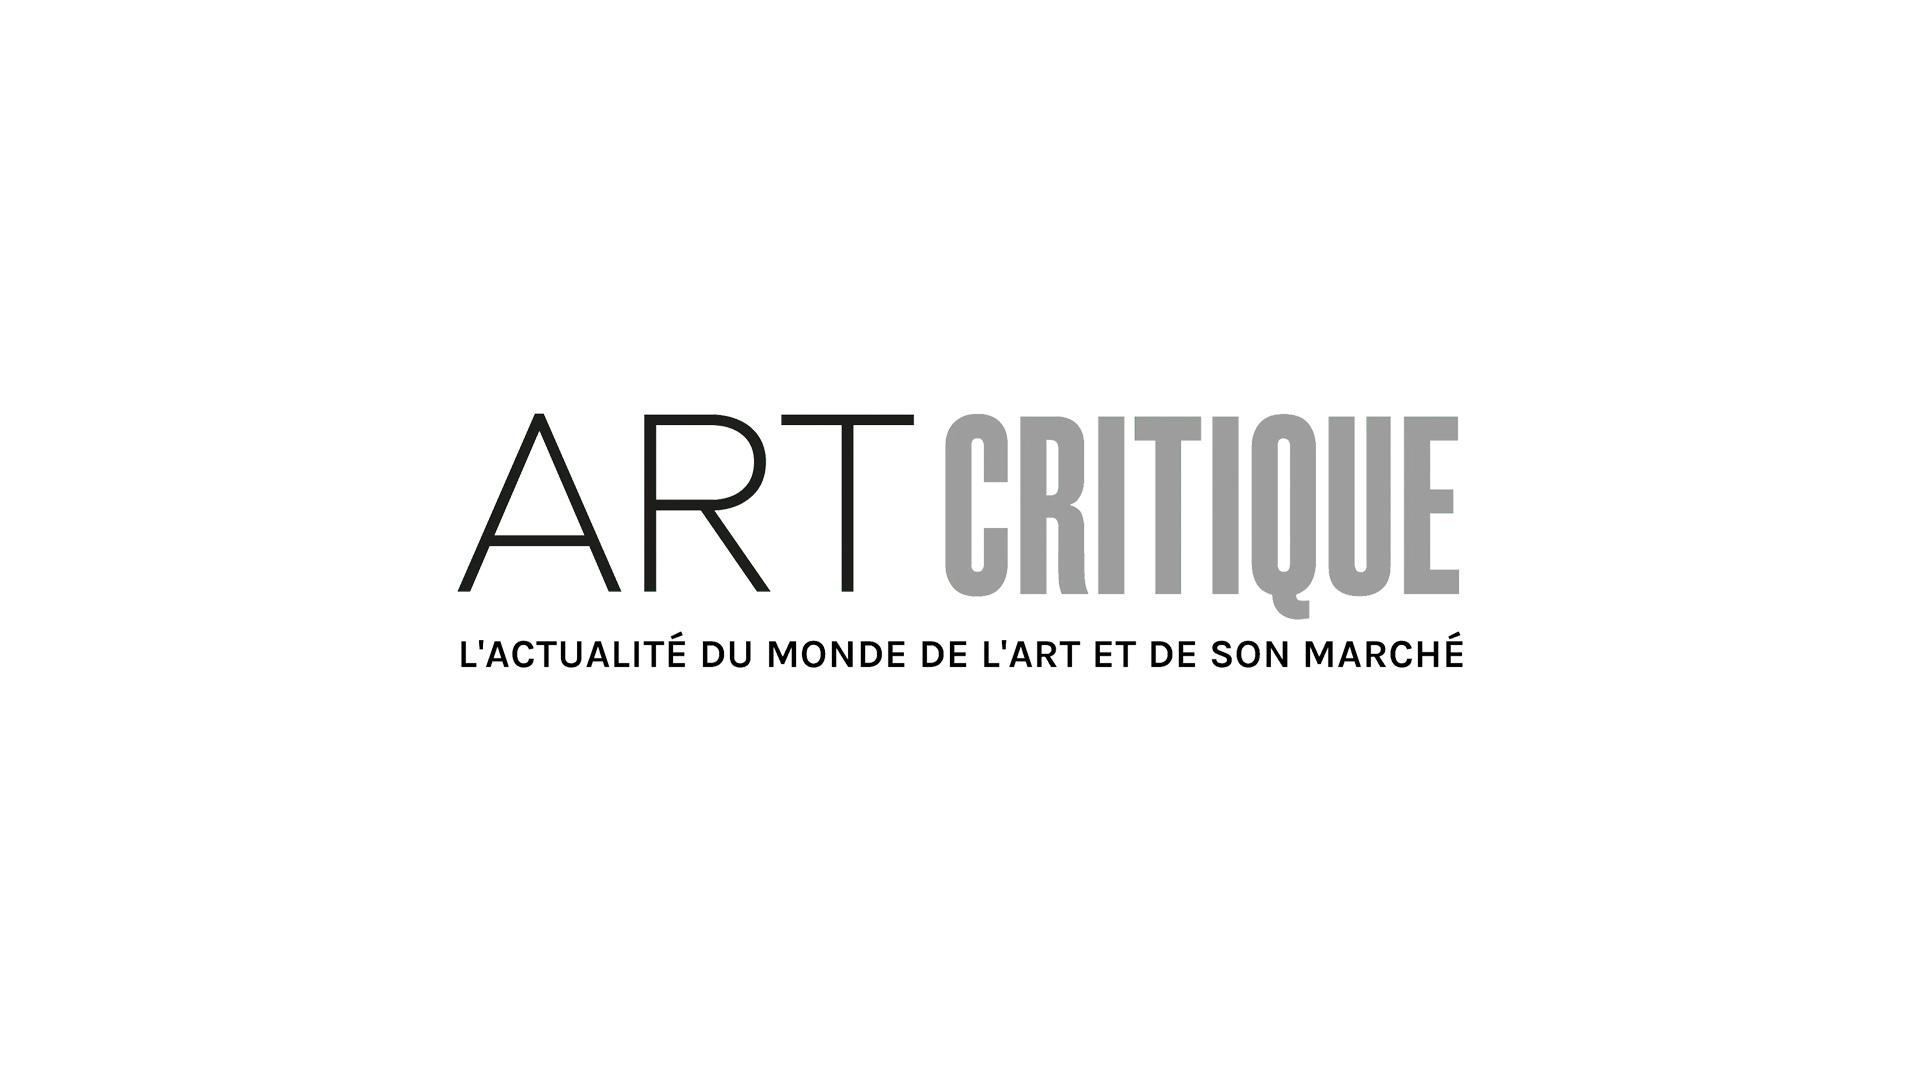 Daniel Dezeuze, a tribute to painting